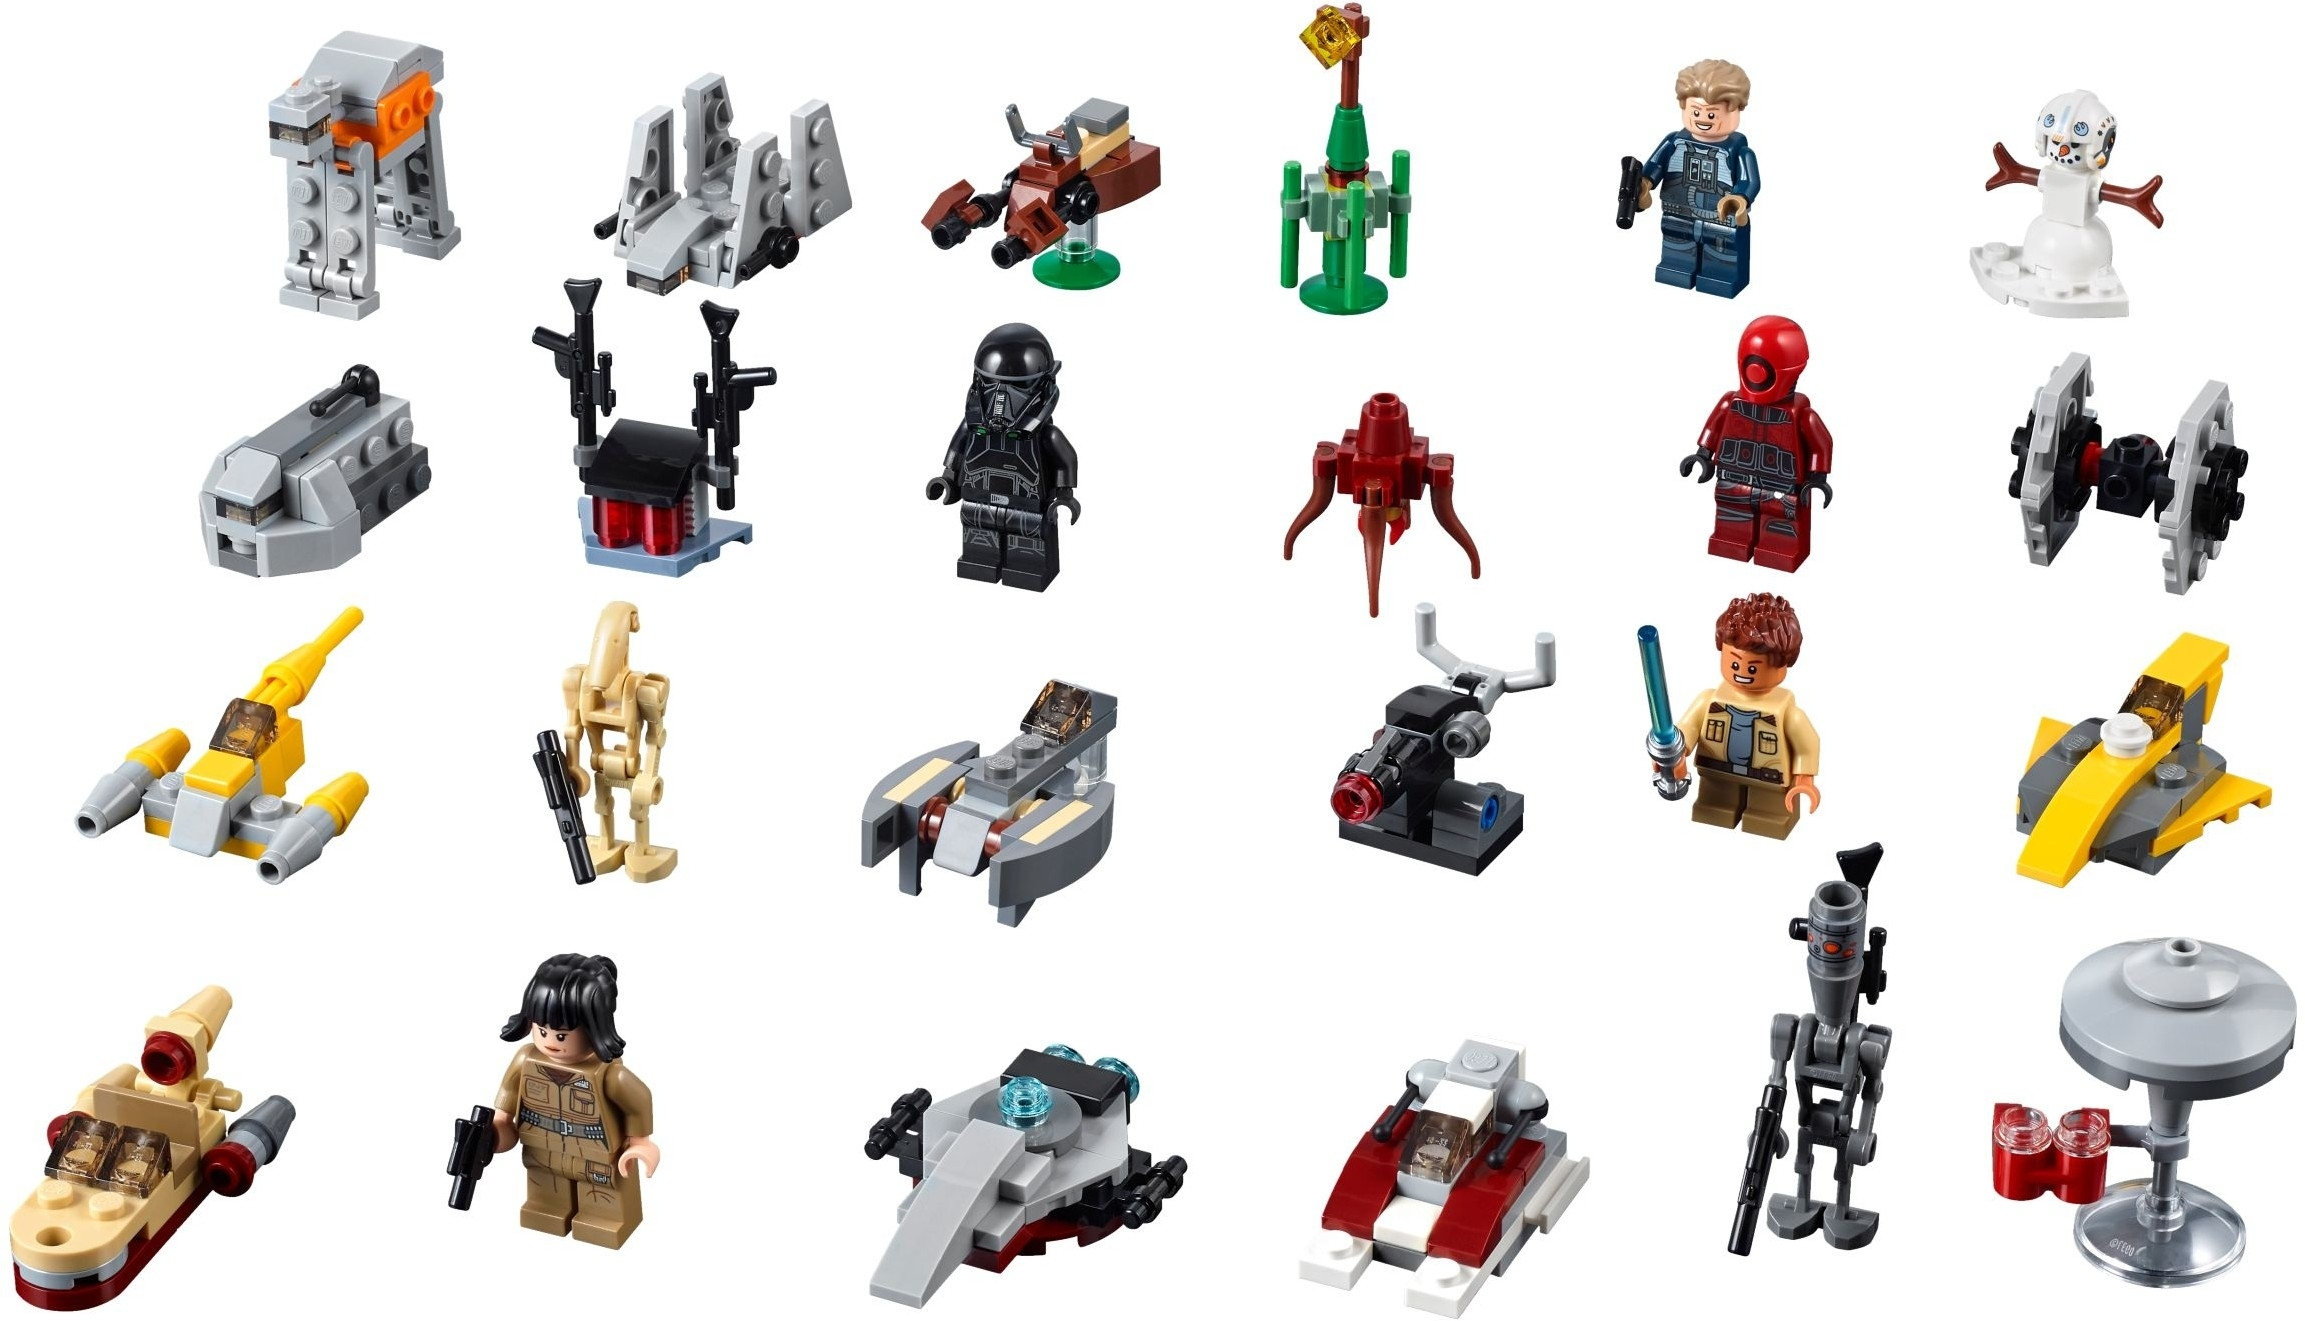 Lego 75213 Star Wars Advent Calendar Instructions, Star Wars throughout Lego Advent Calendar Star Wars Directions